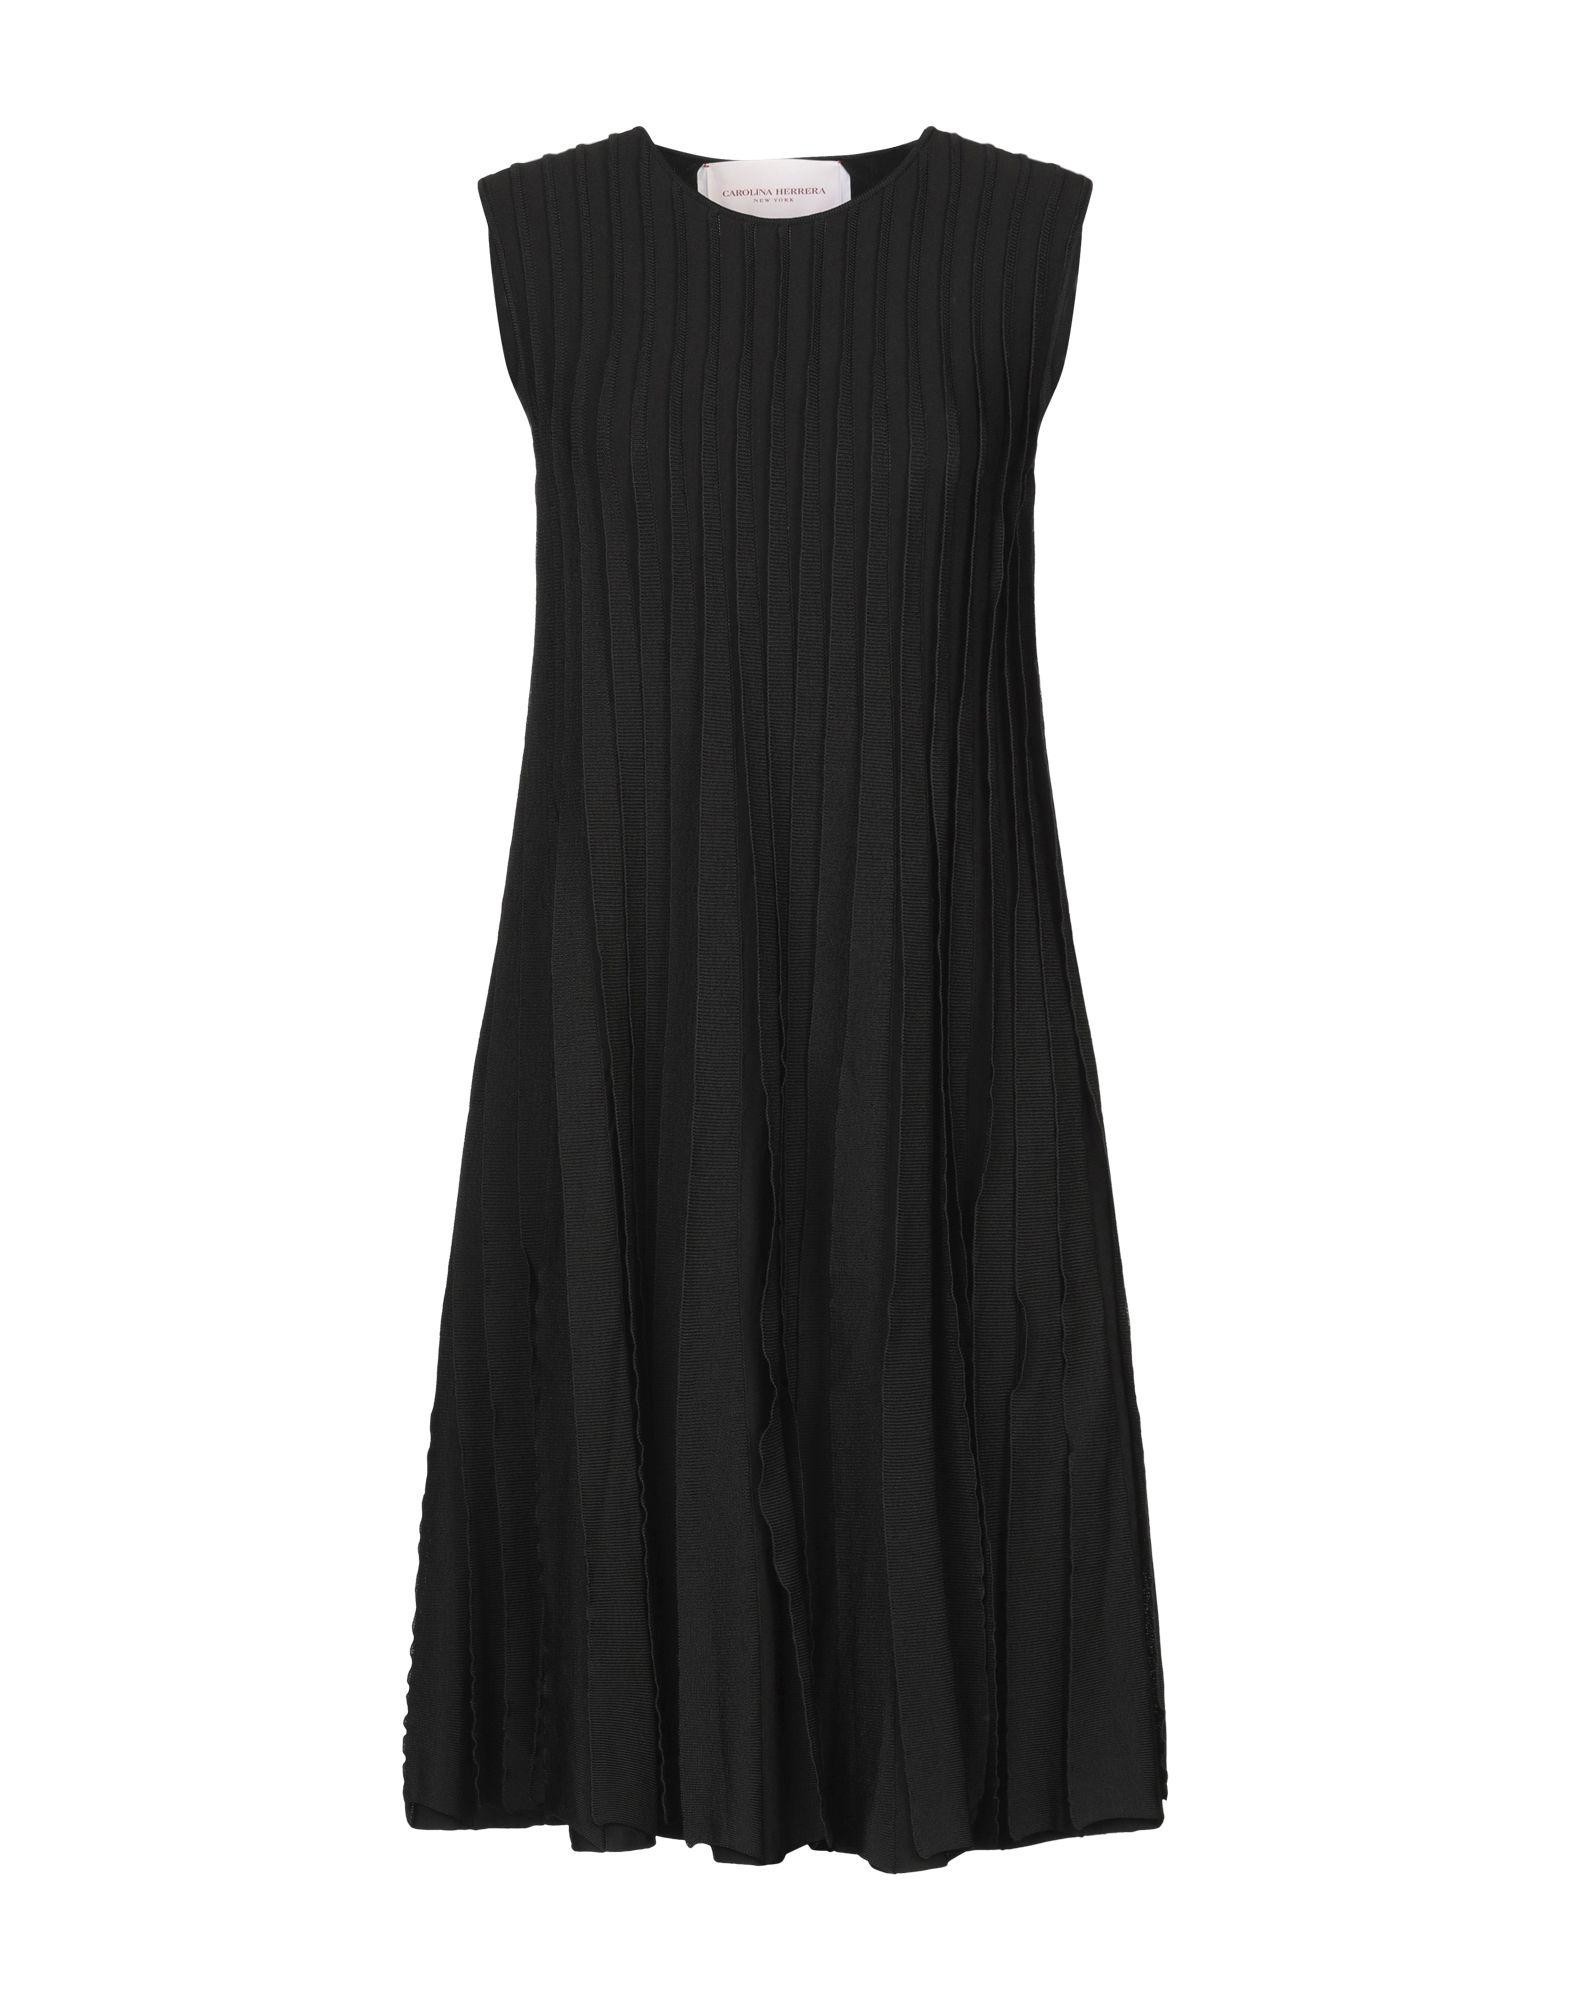 CAROLINA HERRERA Платье до колена платье классического стиля carolina herrera